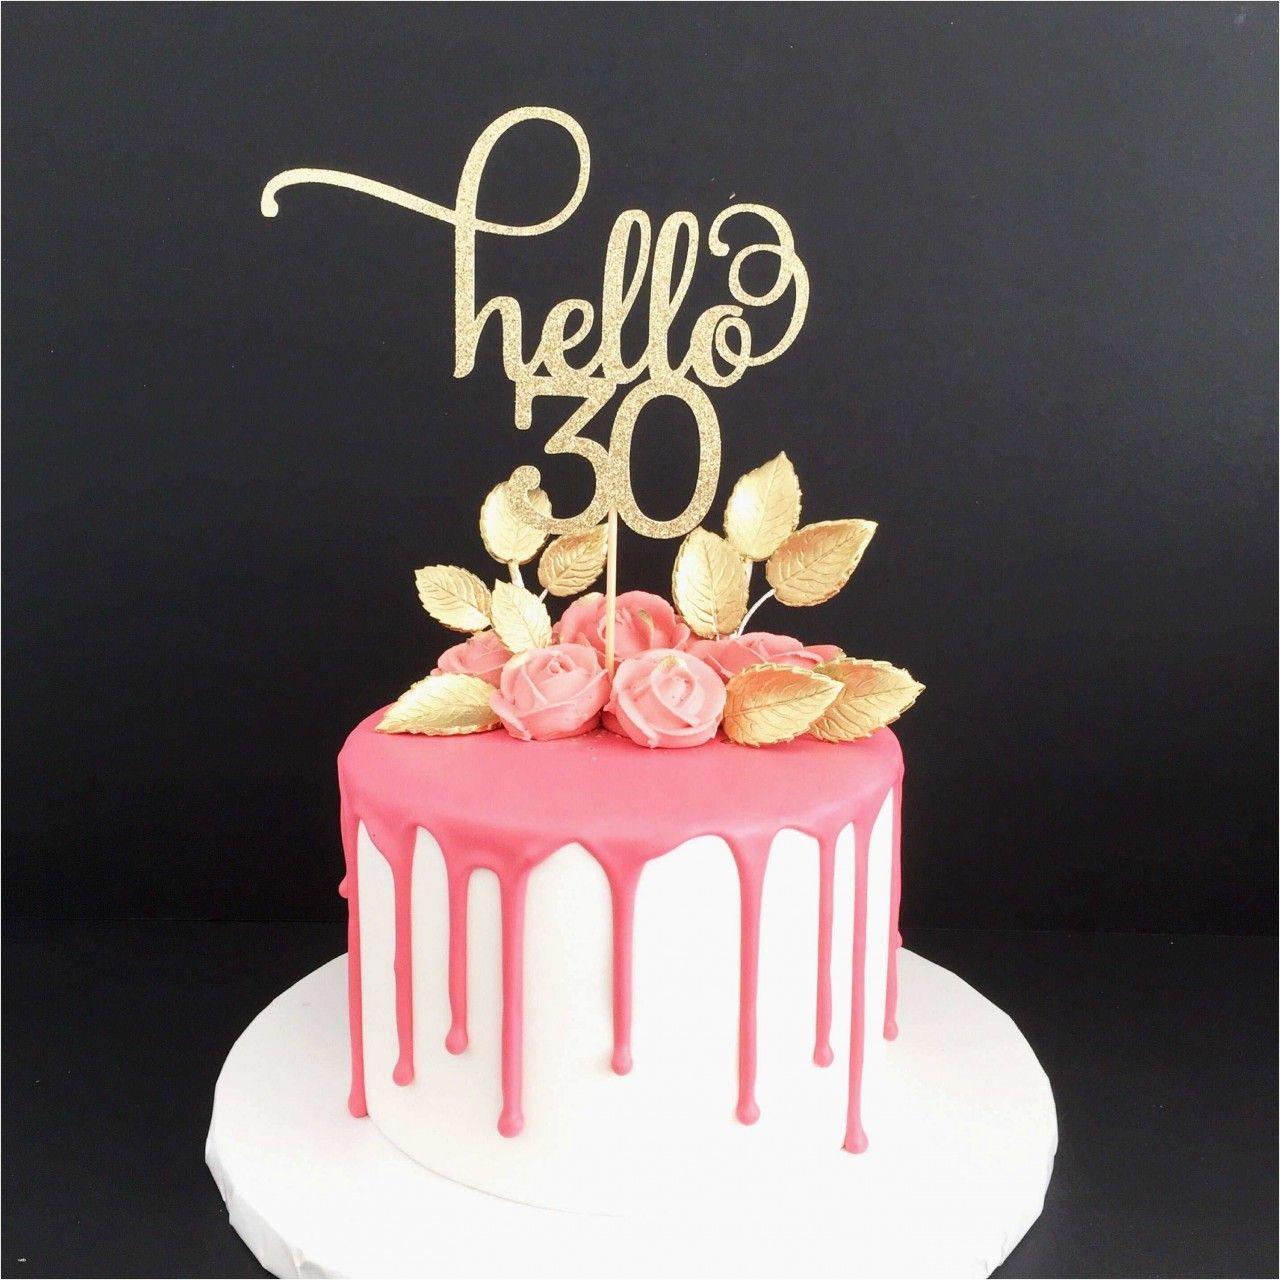 Remarkable 30Th Birthday Cake Ideas Bolos De Aniversario 30 Birthday Cards Printable Opercafe Filternl